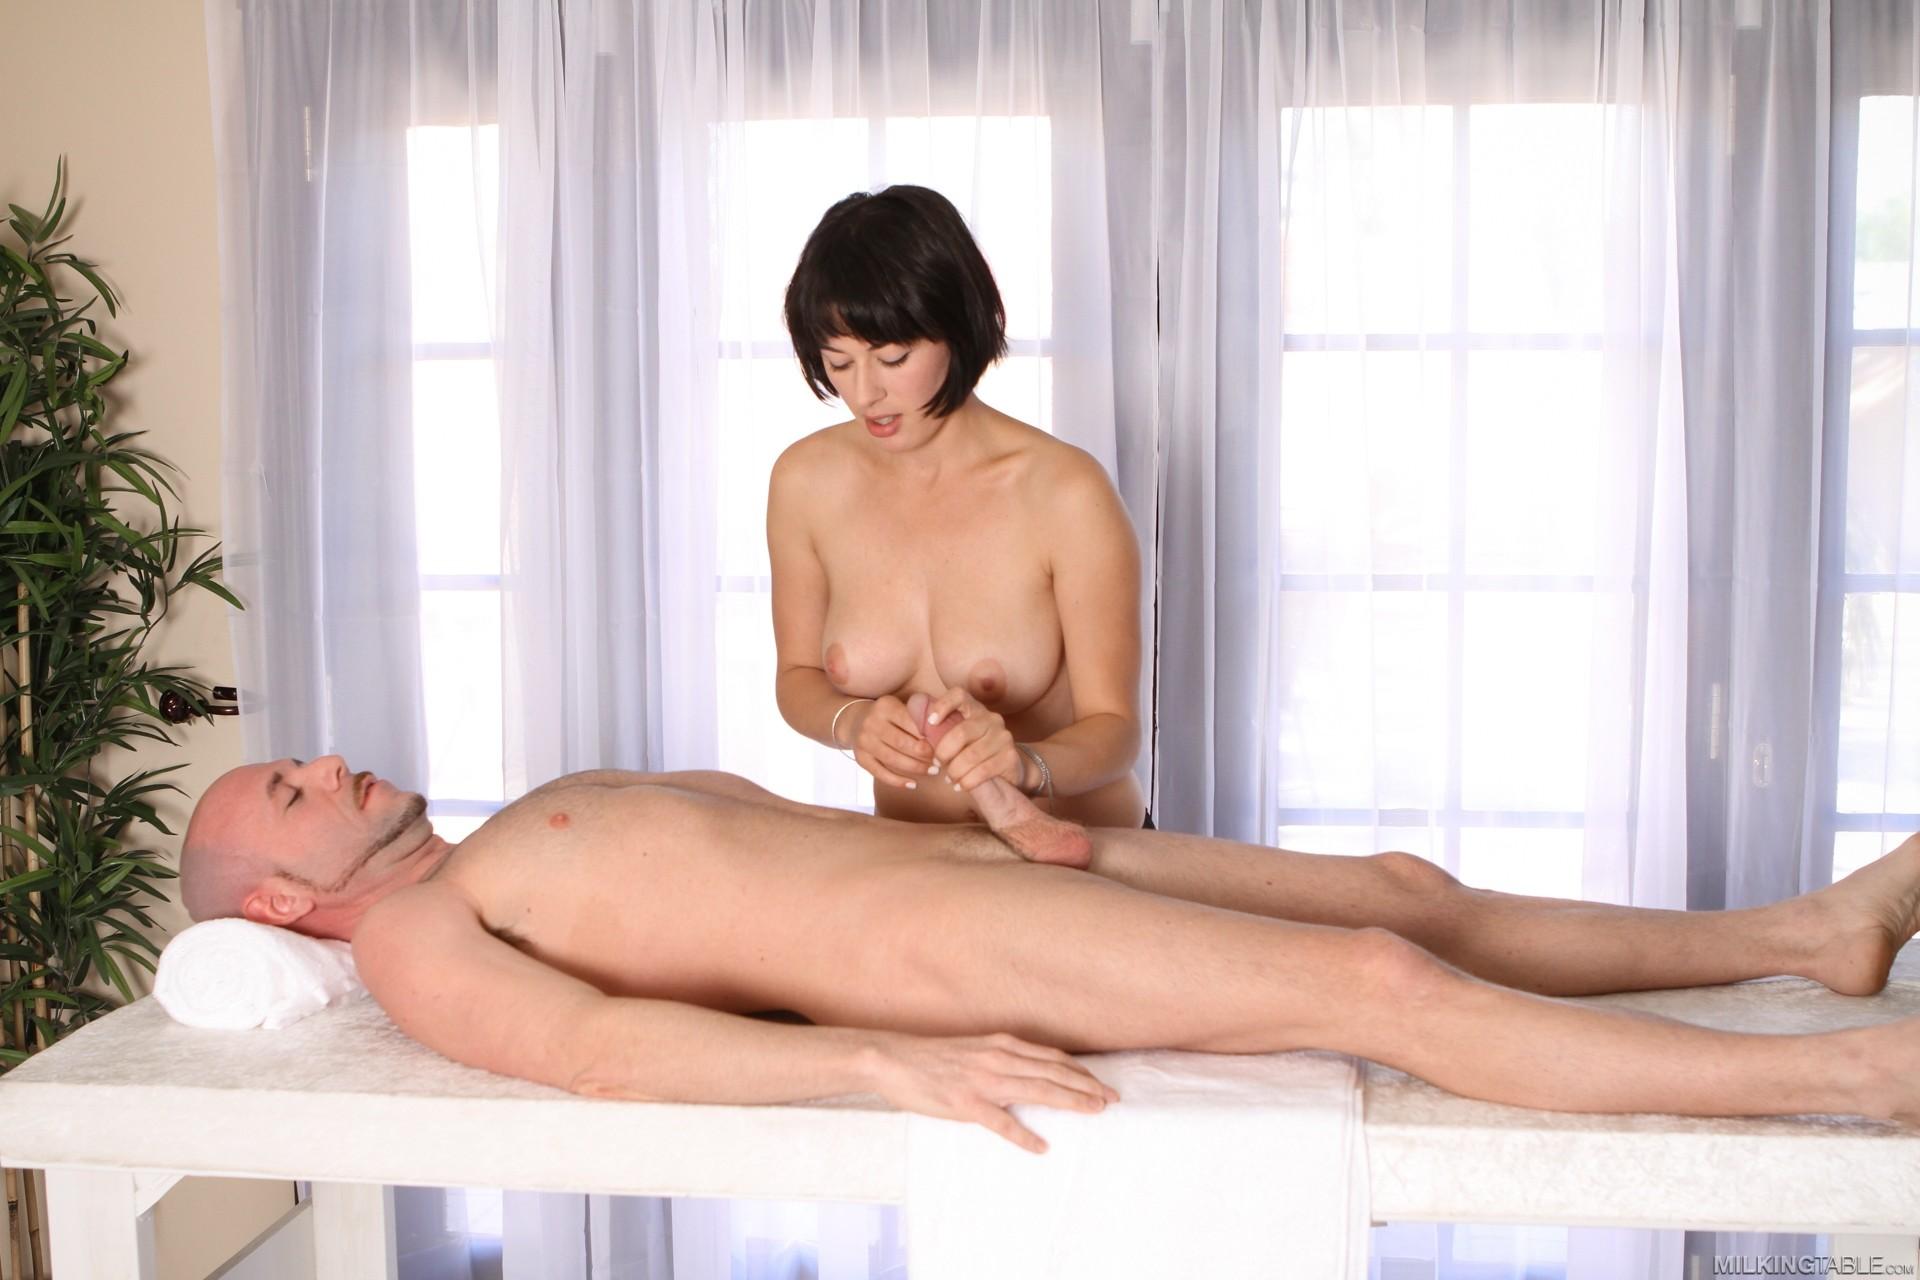 Erotic Cock Milking Massage